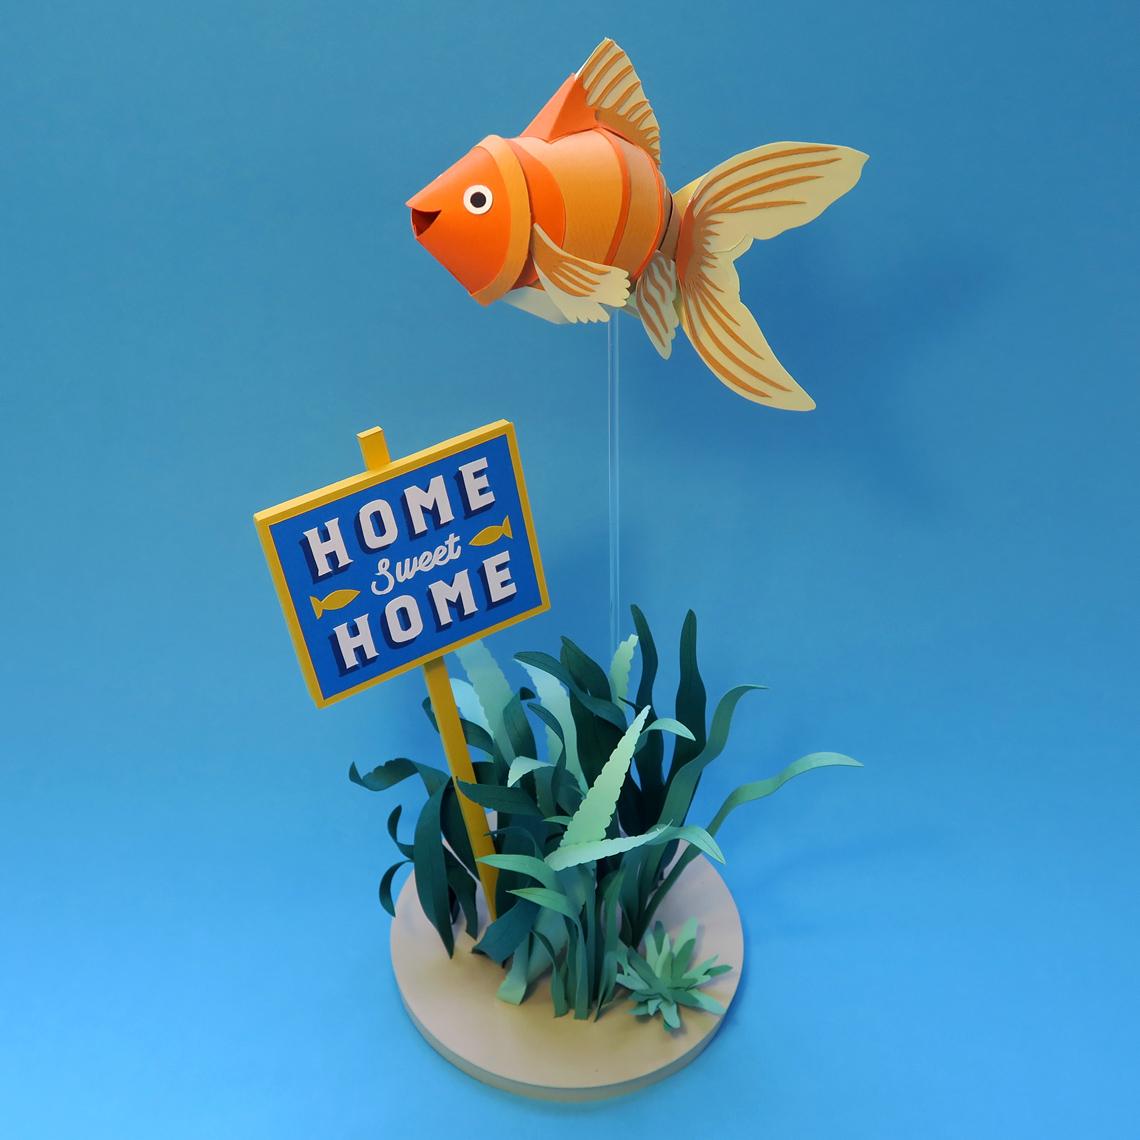 hattie_newman_goldfish copy 2.jpg